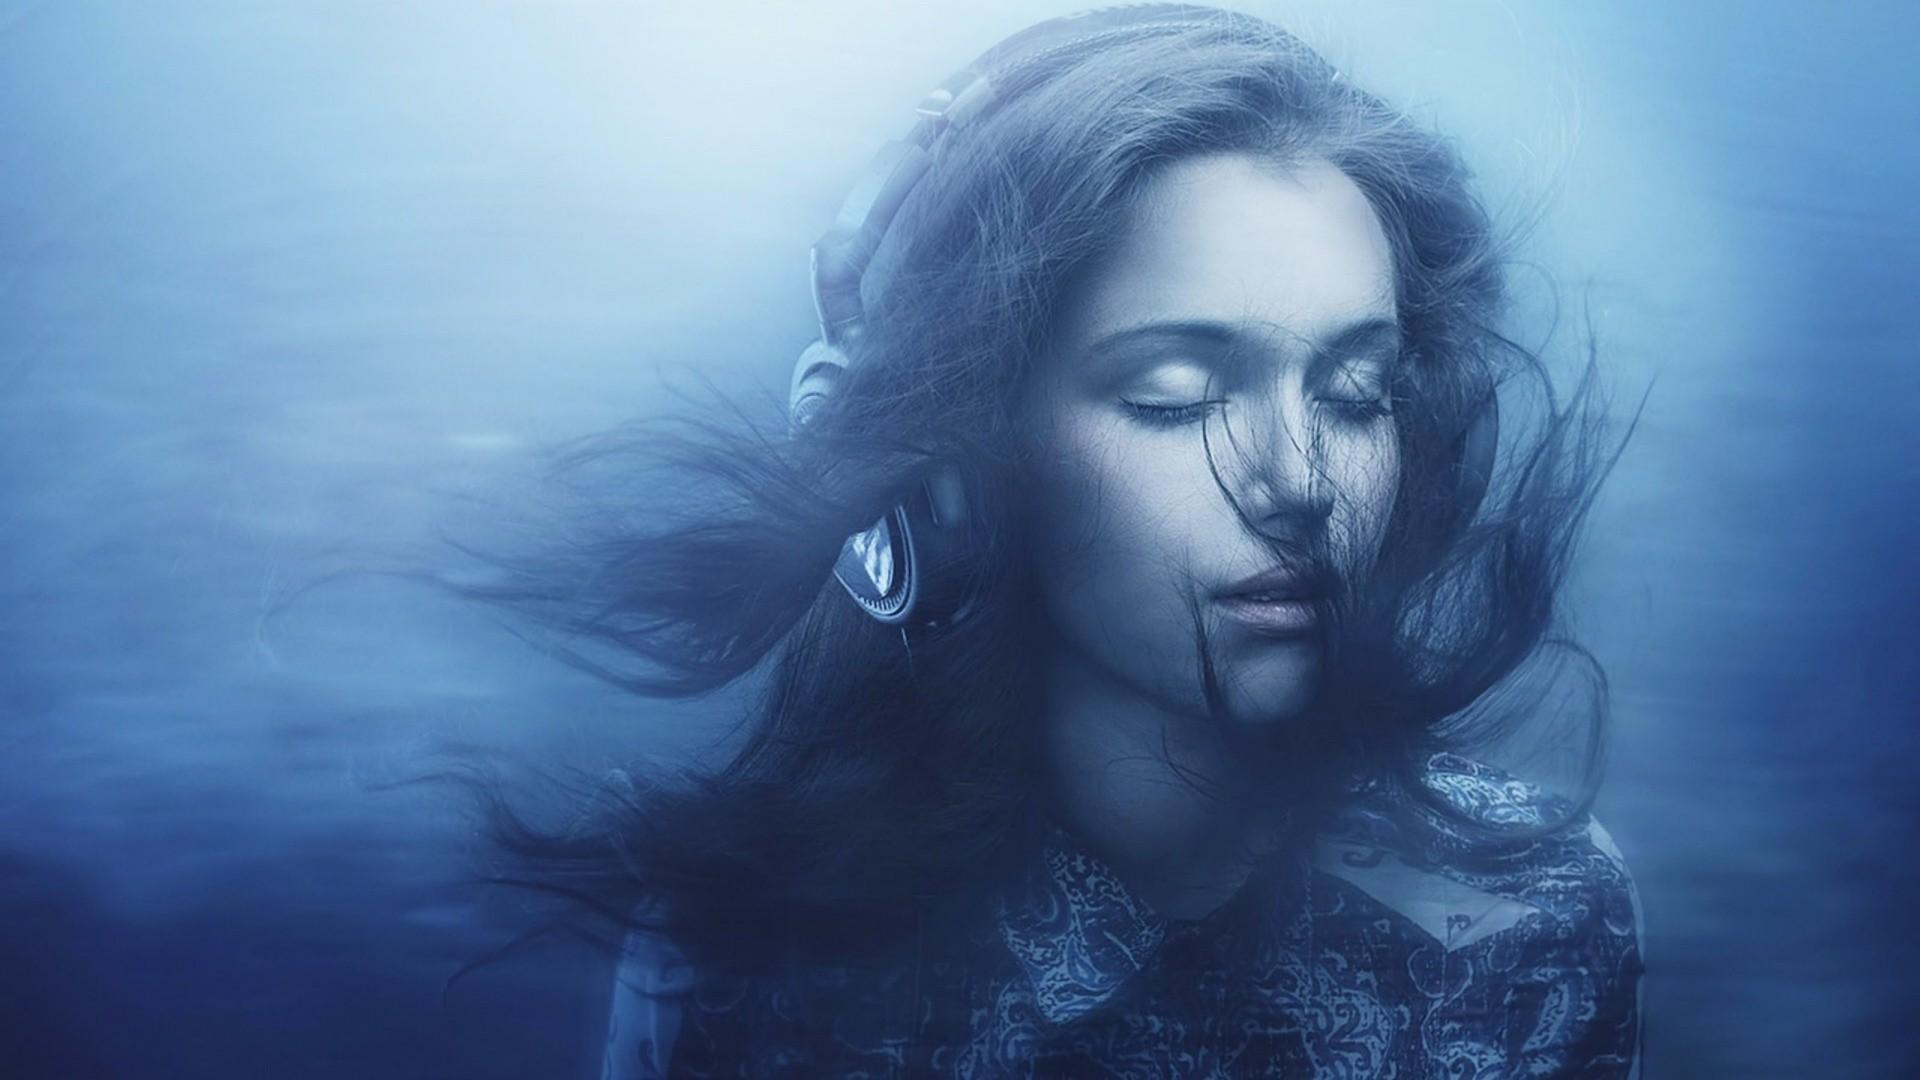 water girl wallpaper (80+ images)